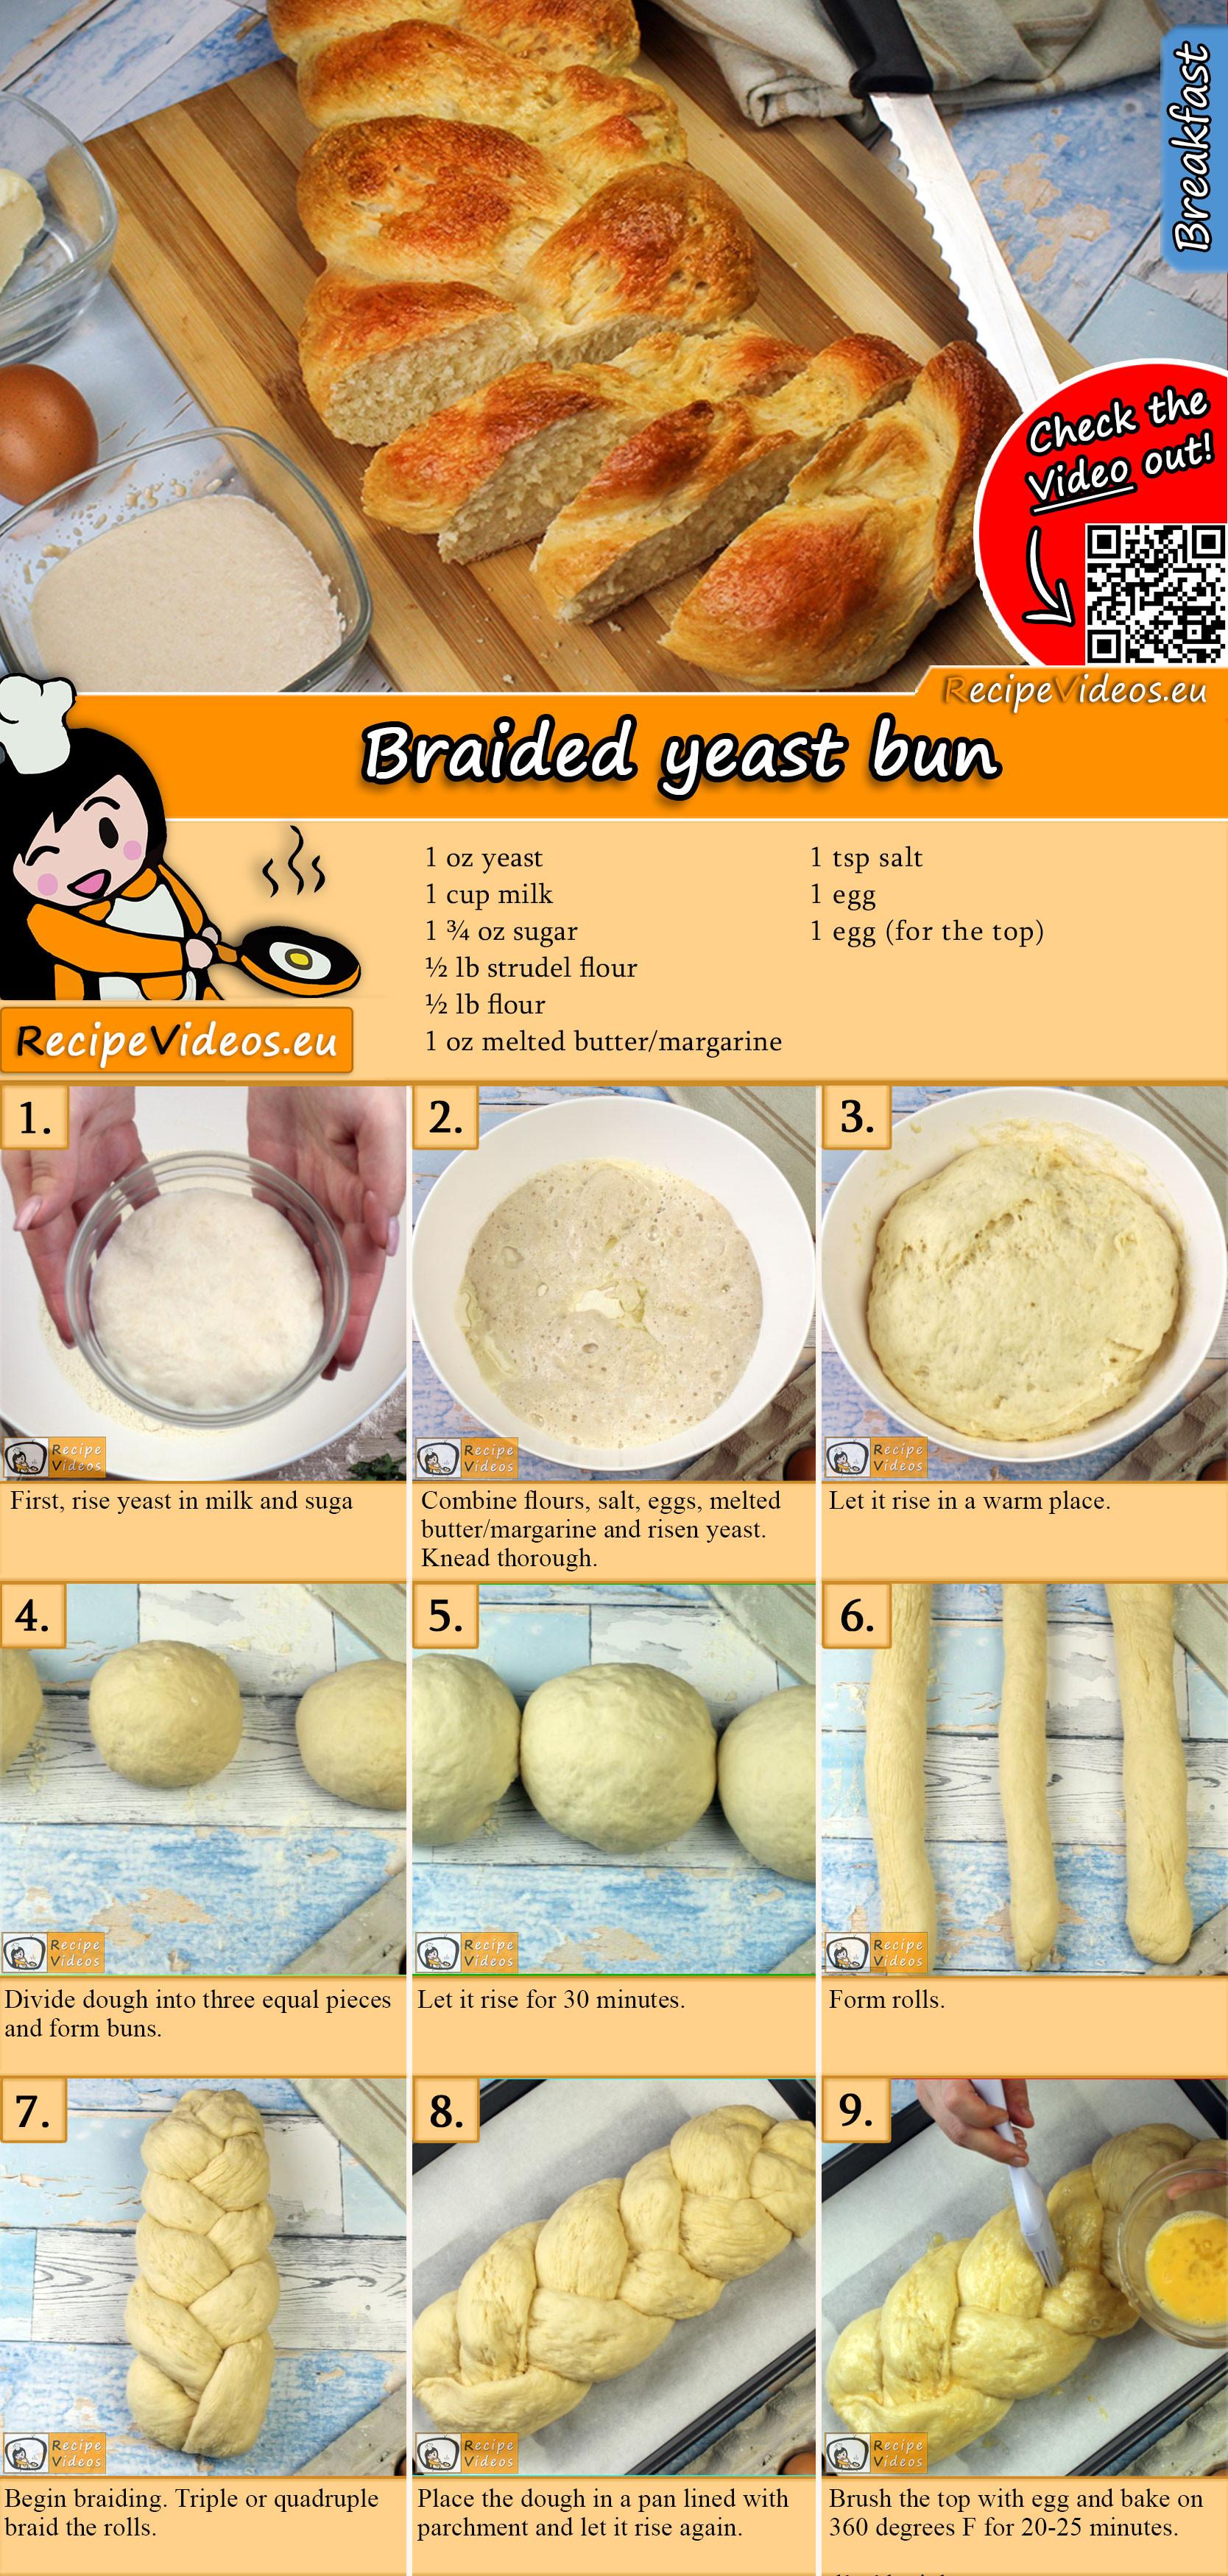 Braided yeast bun recipe with video